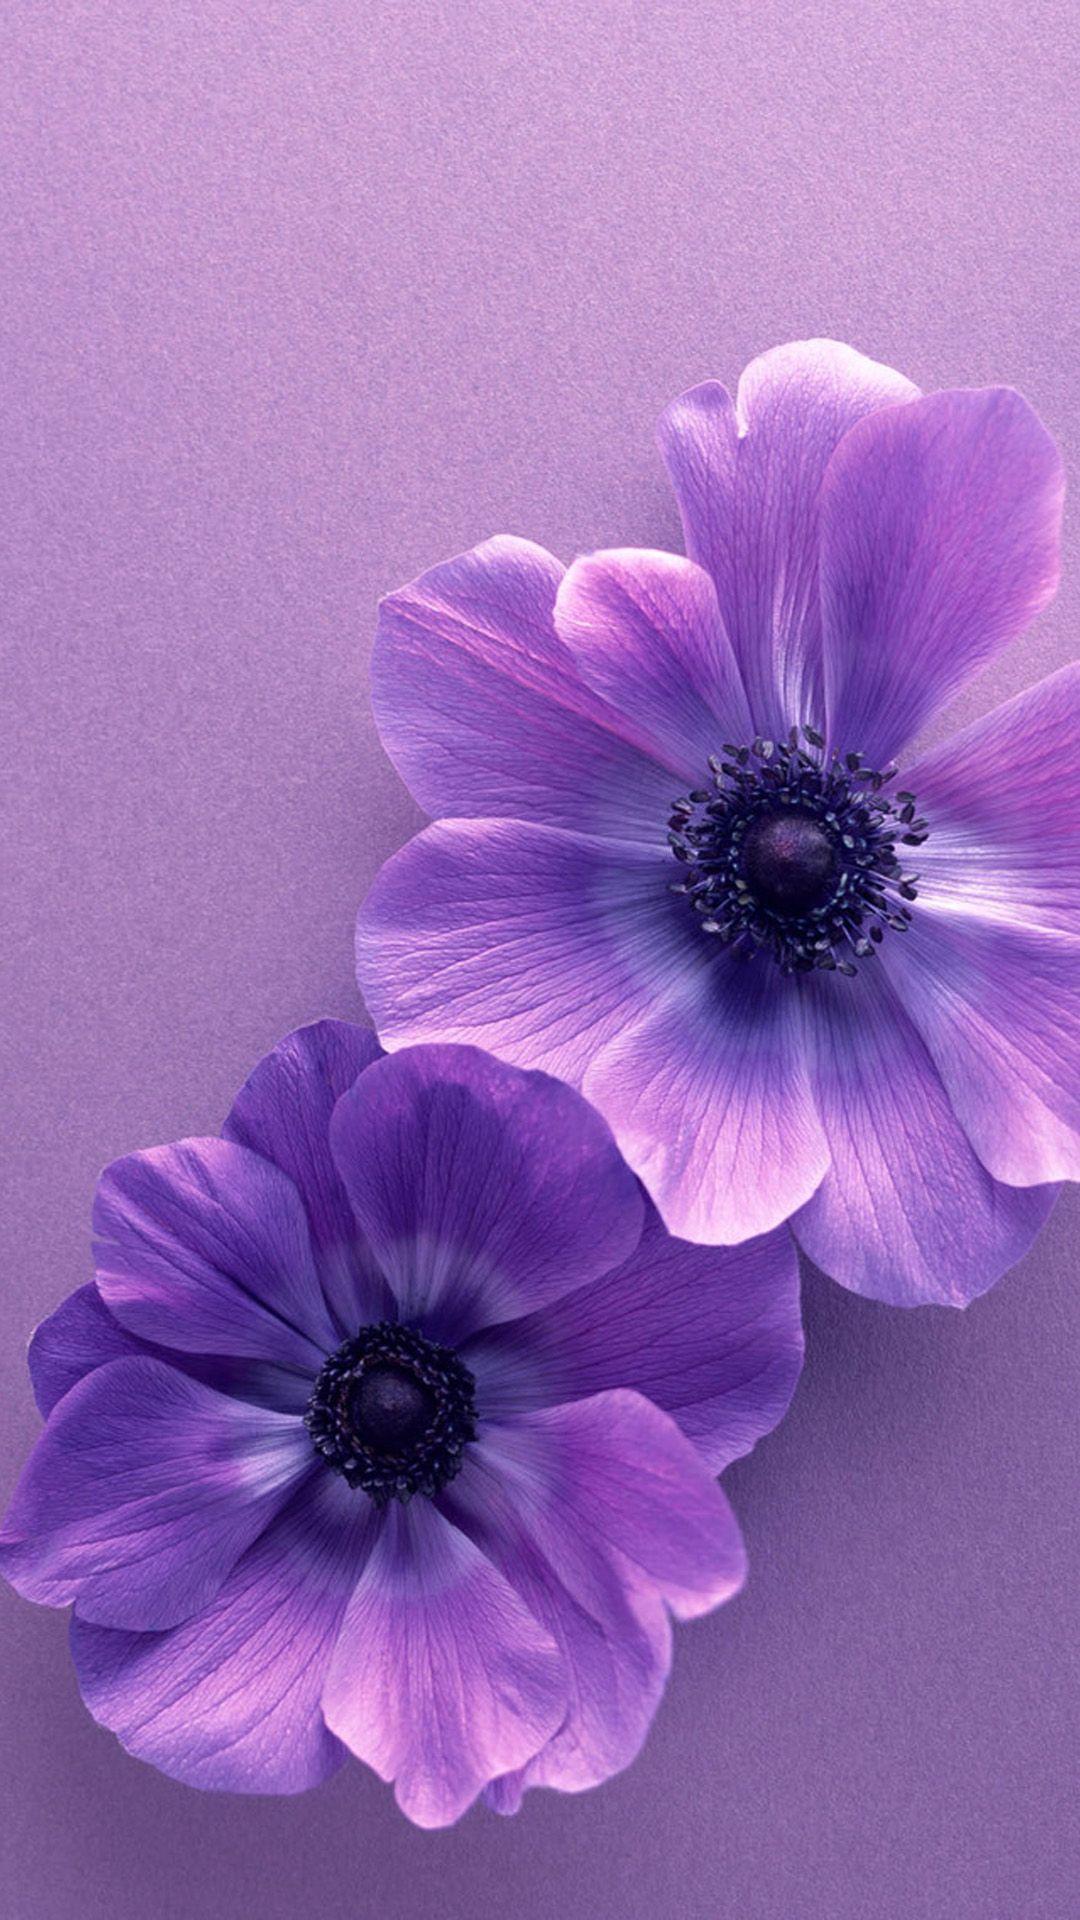 Flower Samsung Galaxy S5 Wallpapers 152 Purple flowers